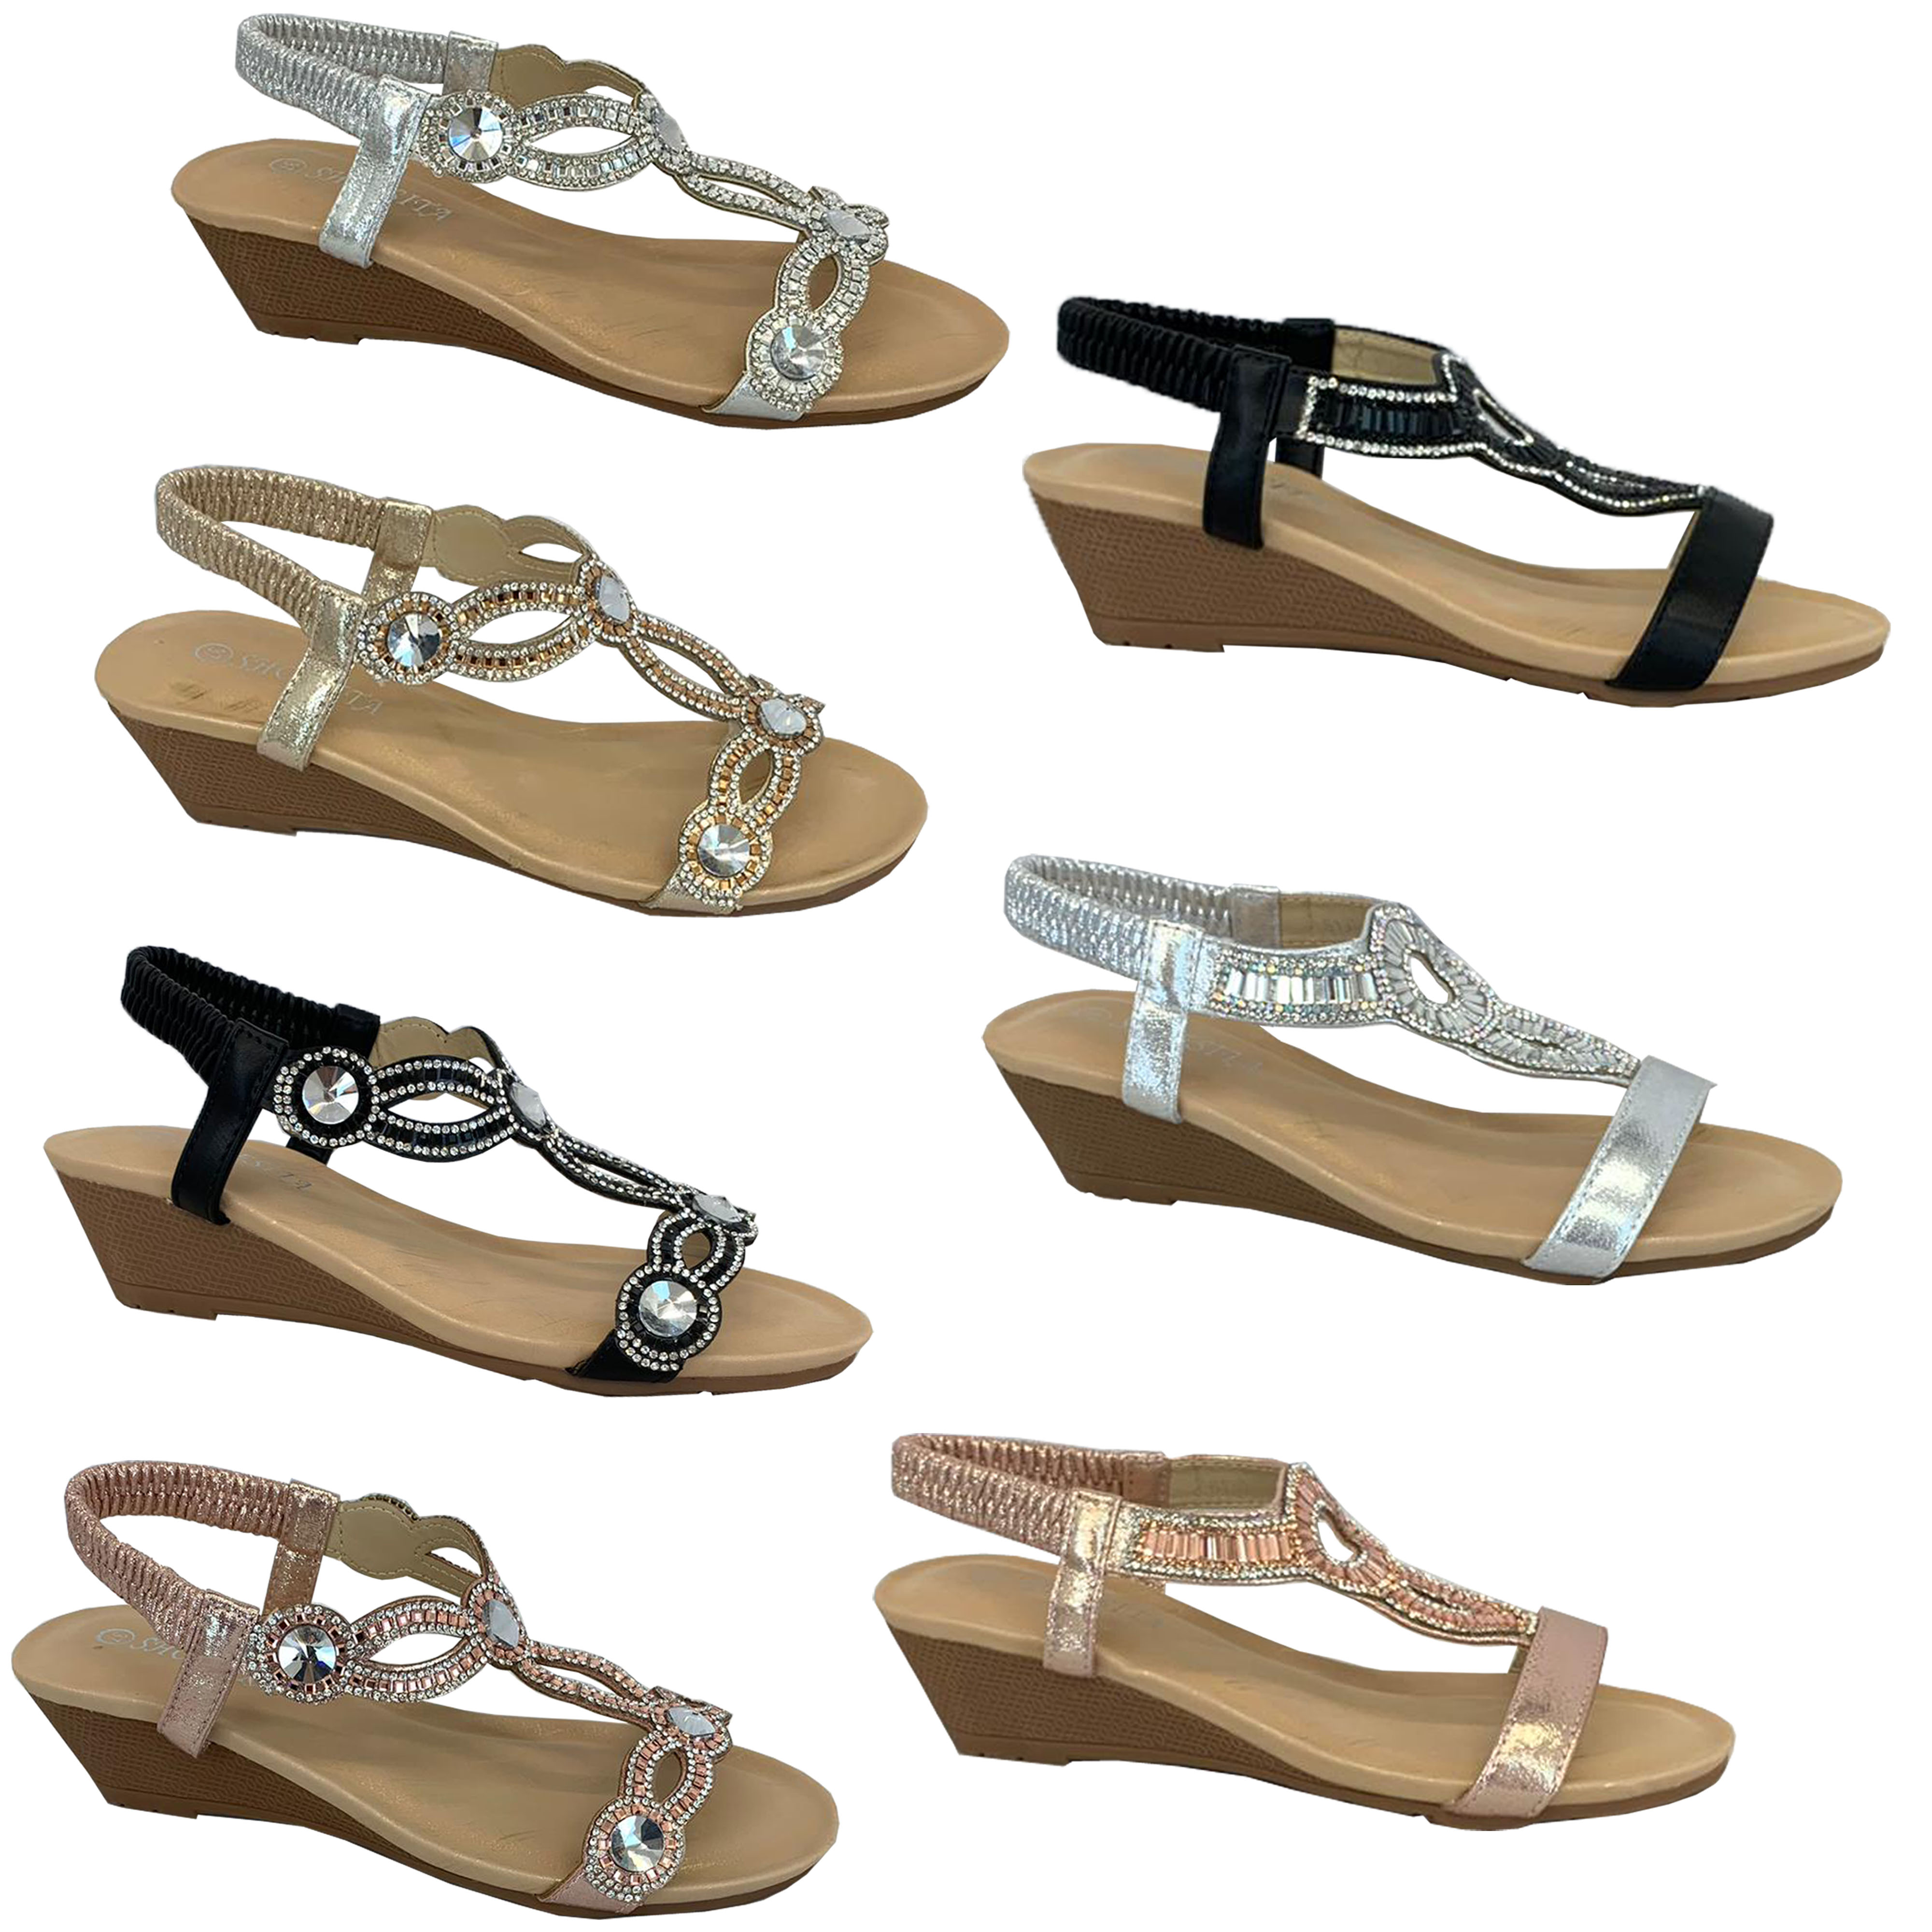 Sehr Keilabsatz Leder Sandalen Damen Nieten Riemen Plateau Sommer Pumps Alltag